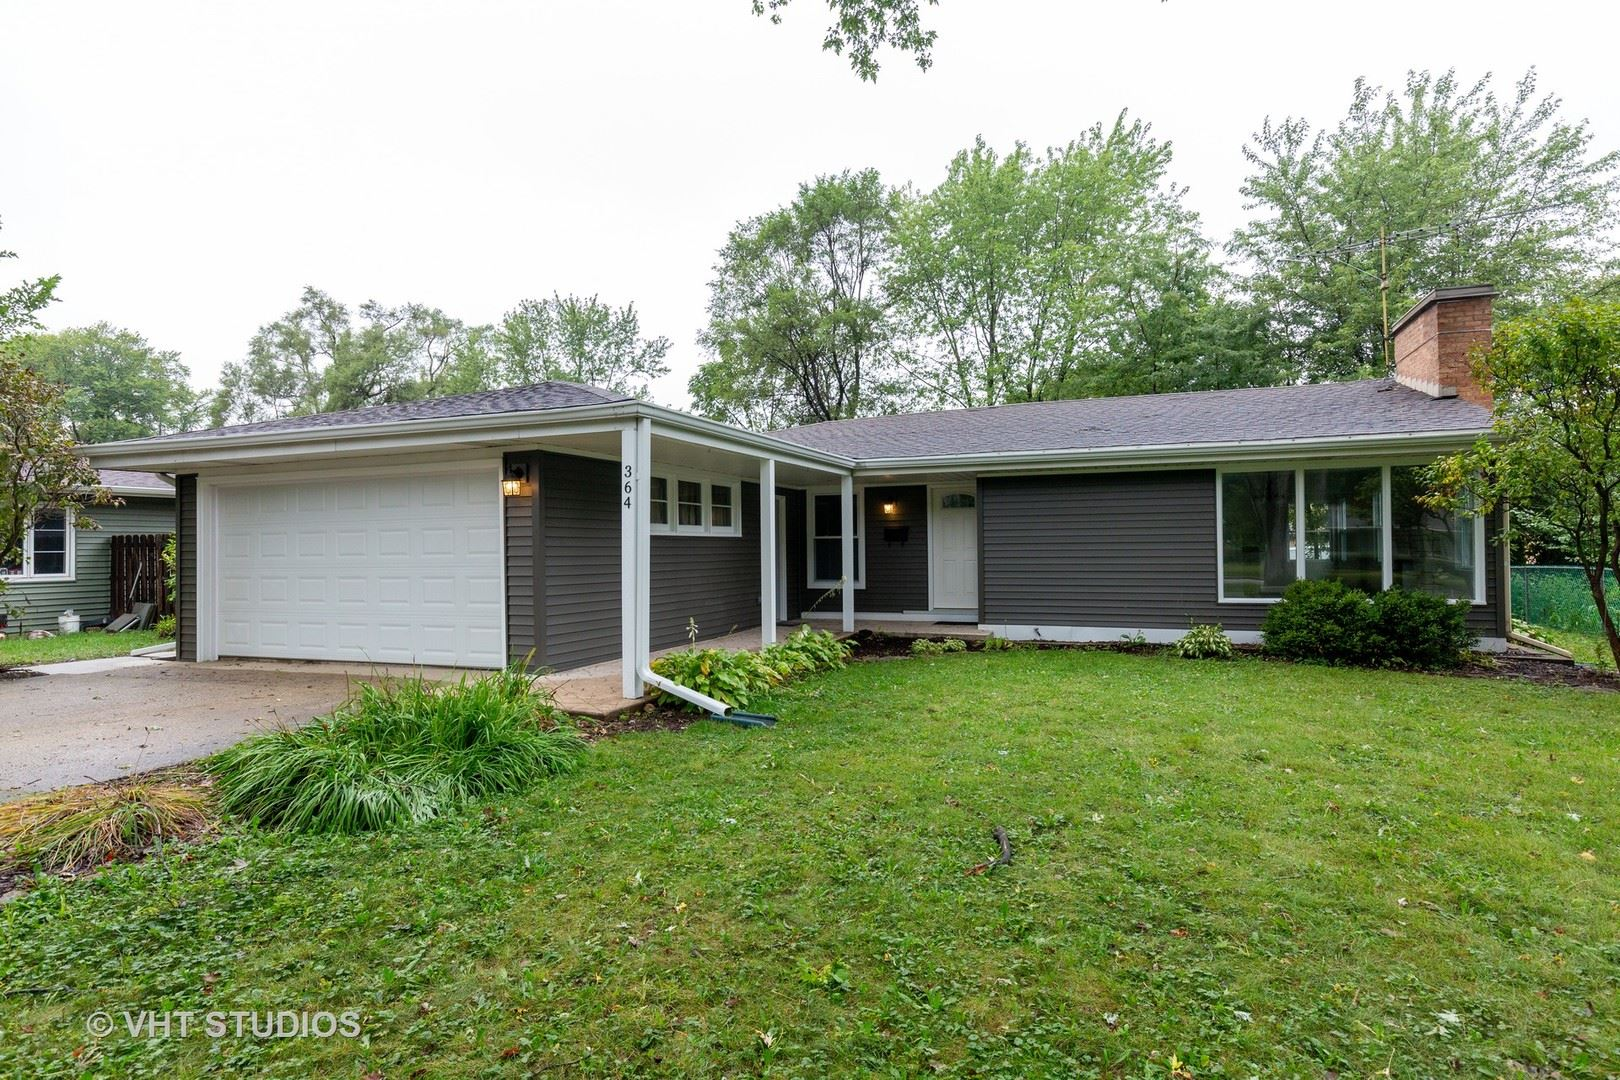 364 Maplewood Lane, Crystal Lake, IL 60014 - #: 10950780